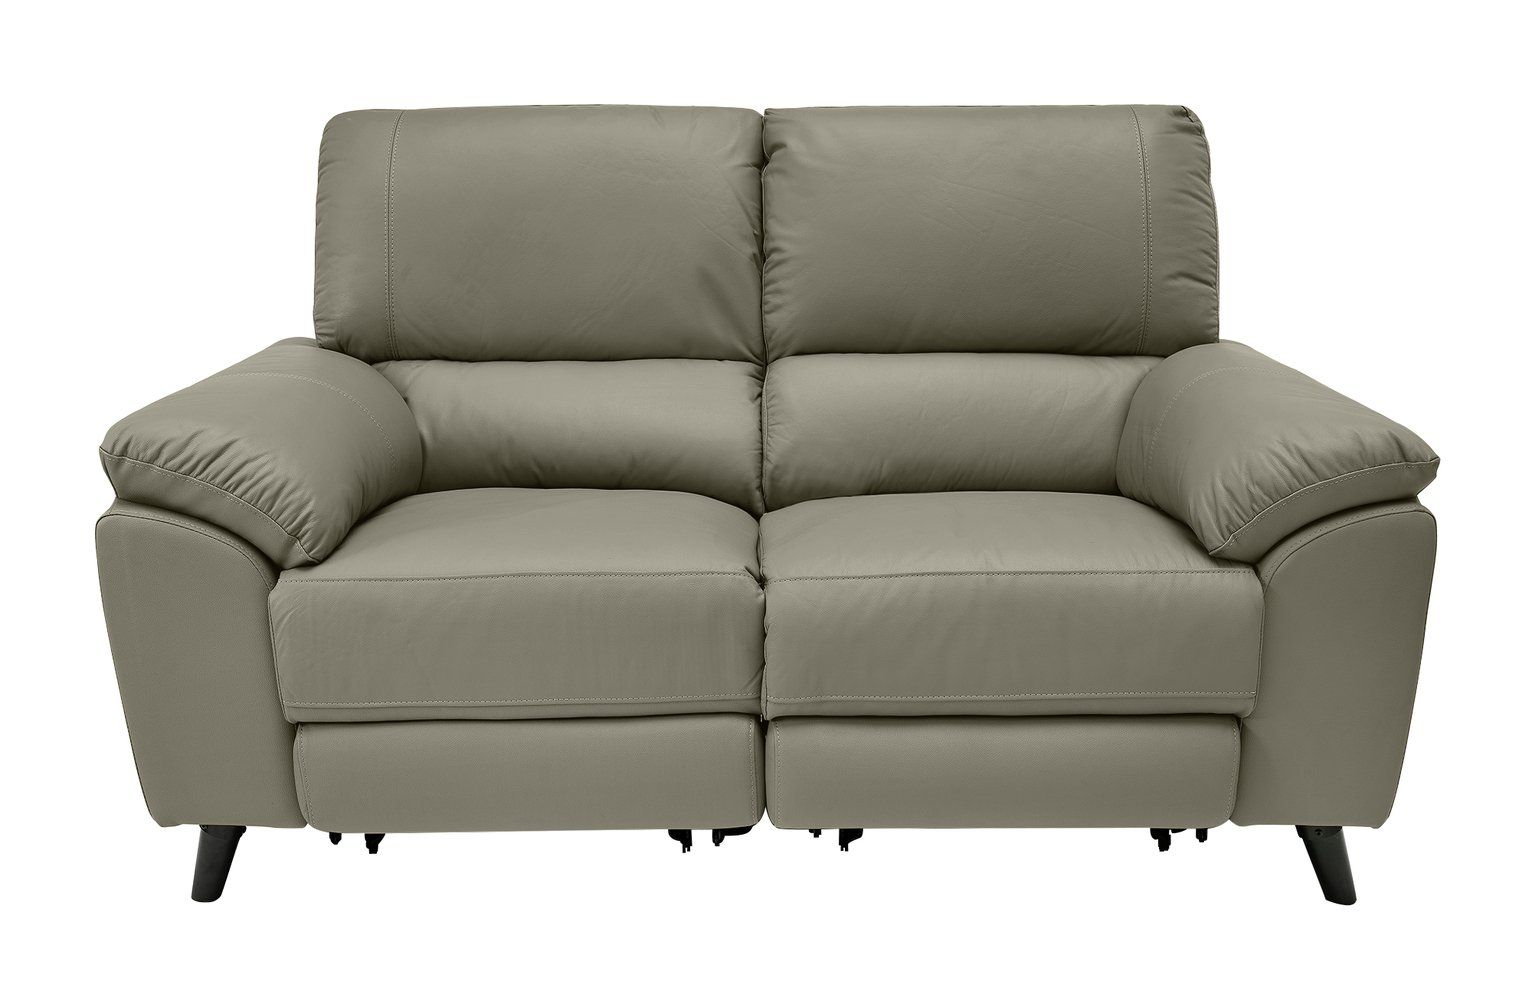 Buy Argos Home Elliot Leather Mix 2 Seater Recliner Sofa Grey Sofas In 2020 Reclining Sofa Teal Sofa Black Sofa